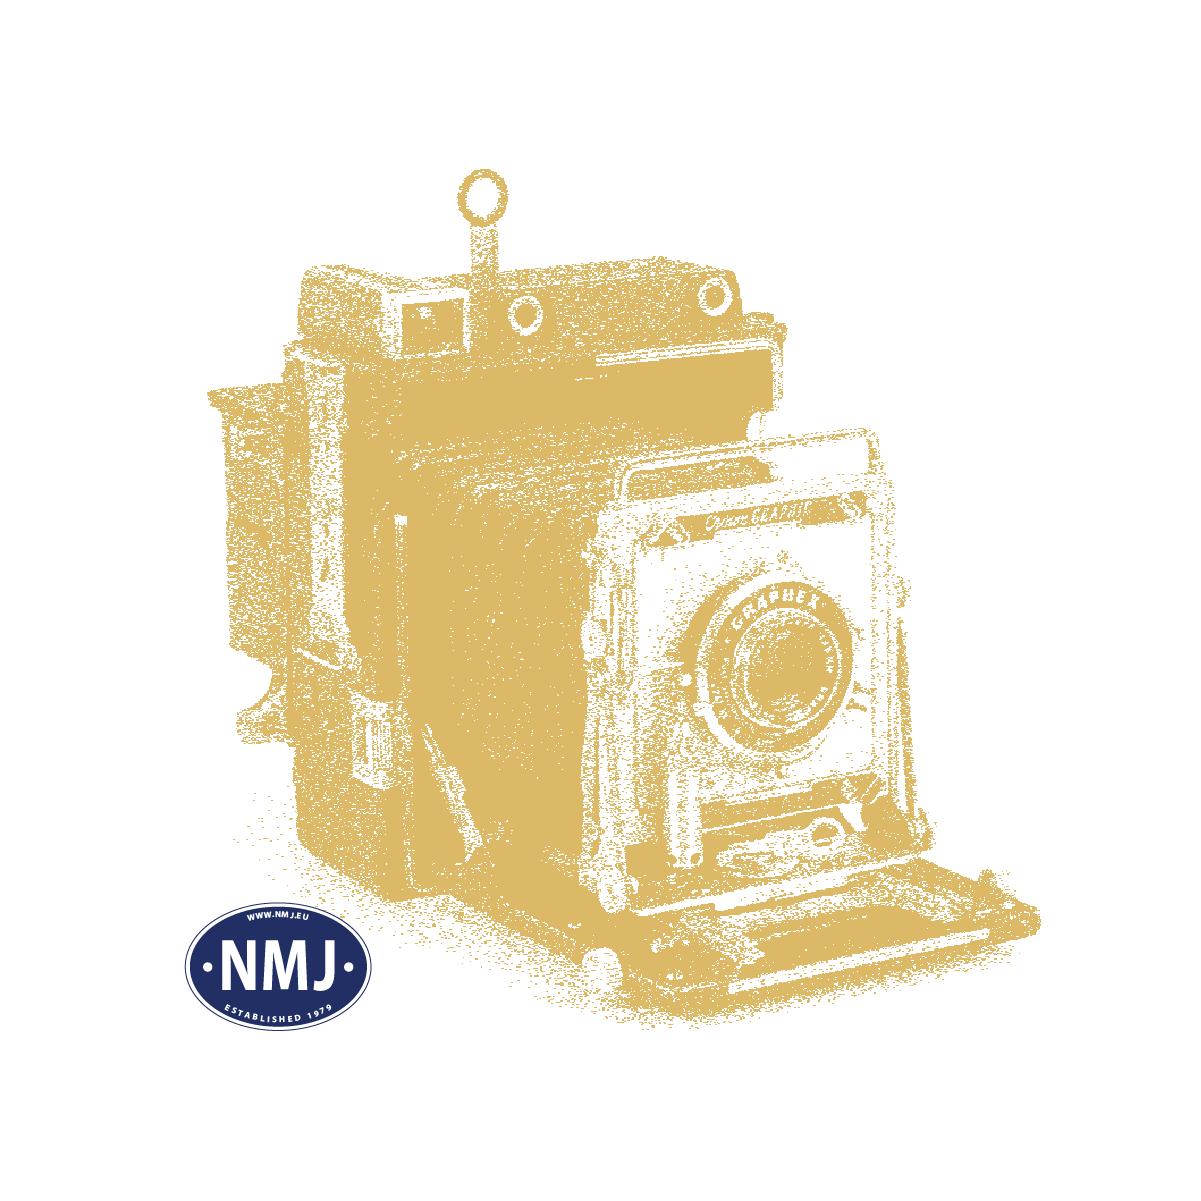 NMJT145403 - NMJ Topline SNCB 5211, DC Analogue, 0-Scale